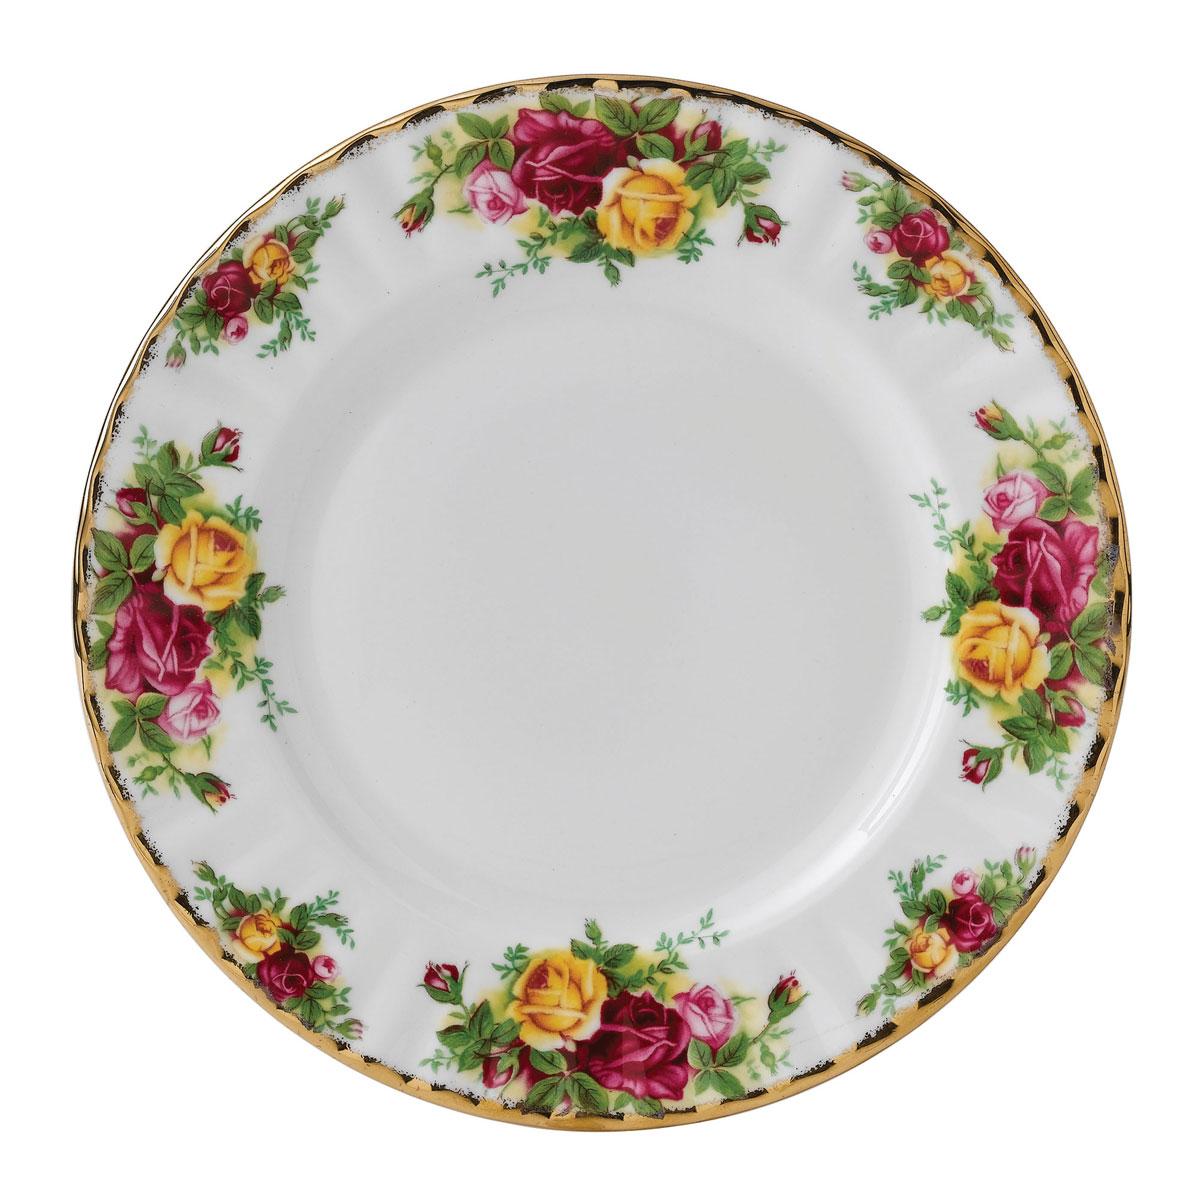 Royal Albert Old Country Roses Salad Plate, Single